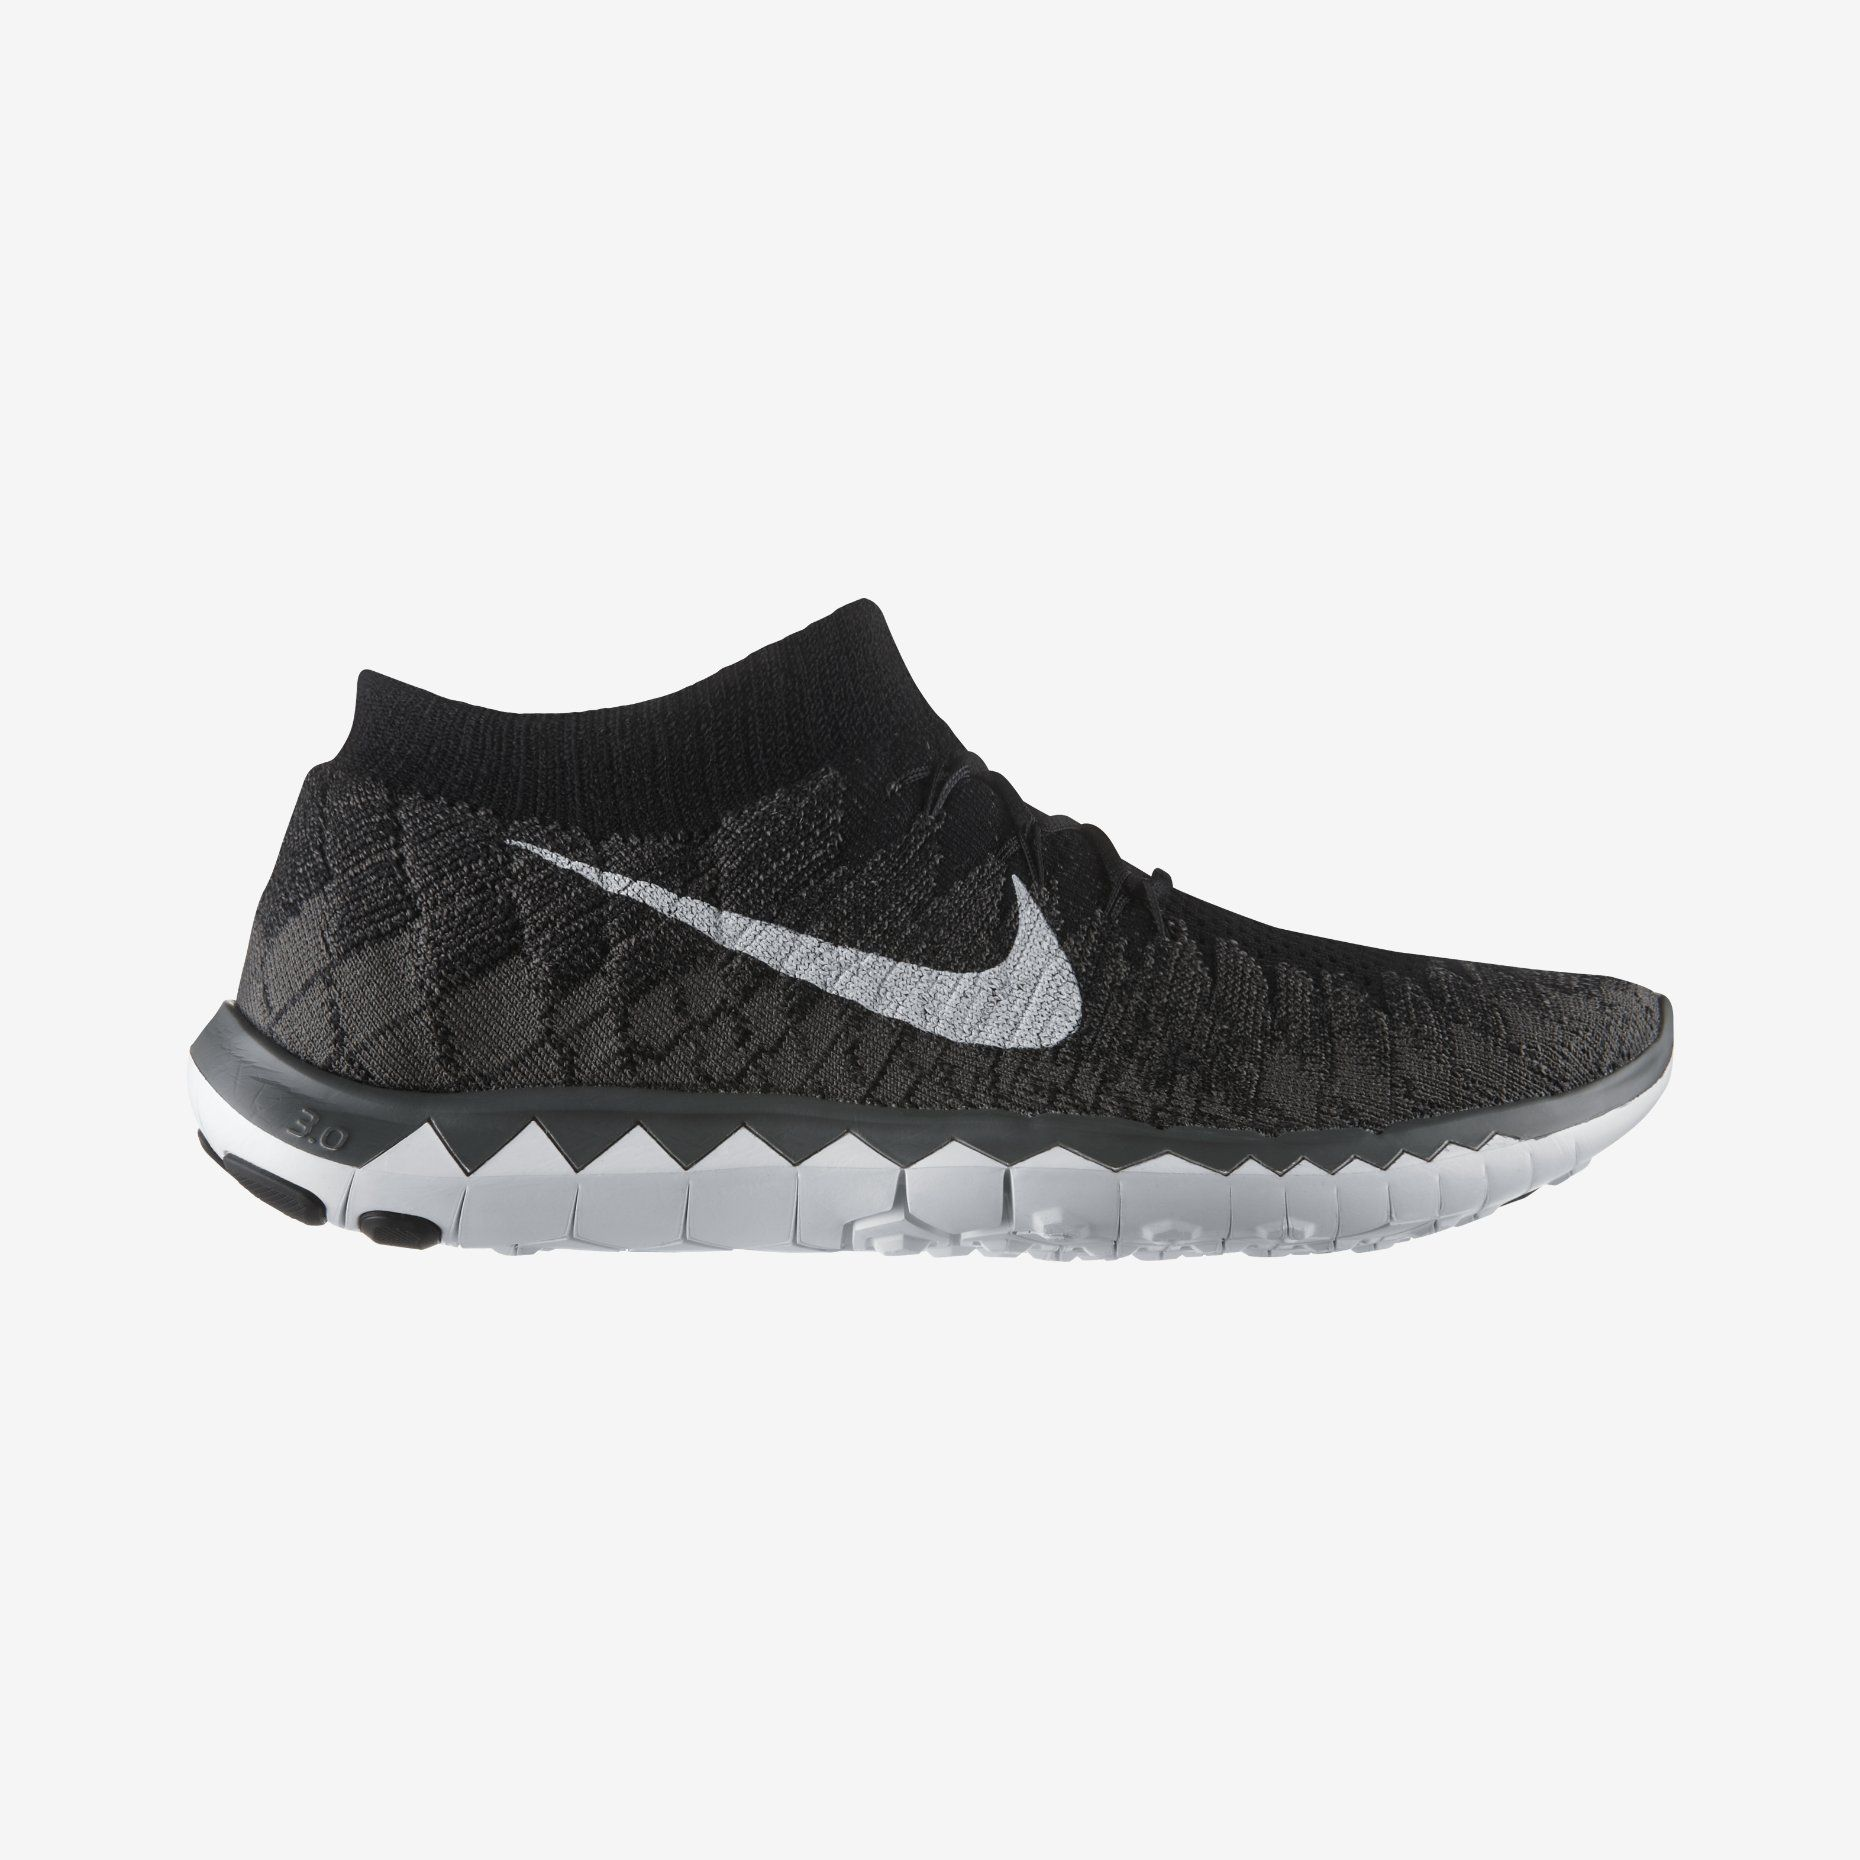 5fdc90ae32600 Nike Free 3.0 Flyknit